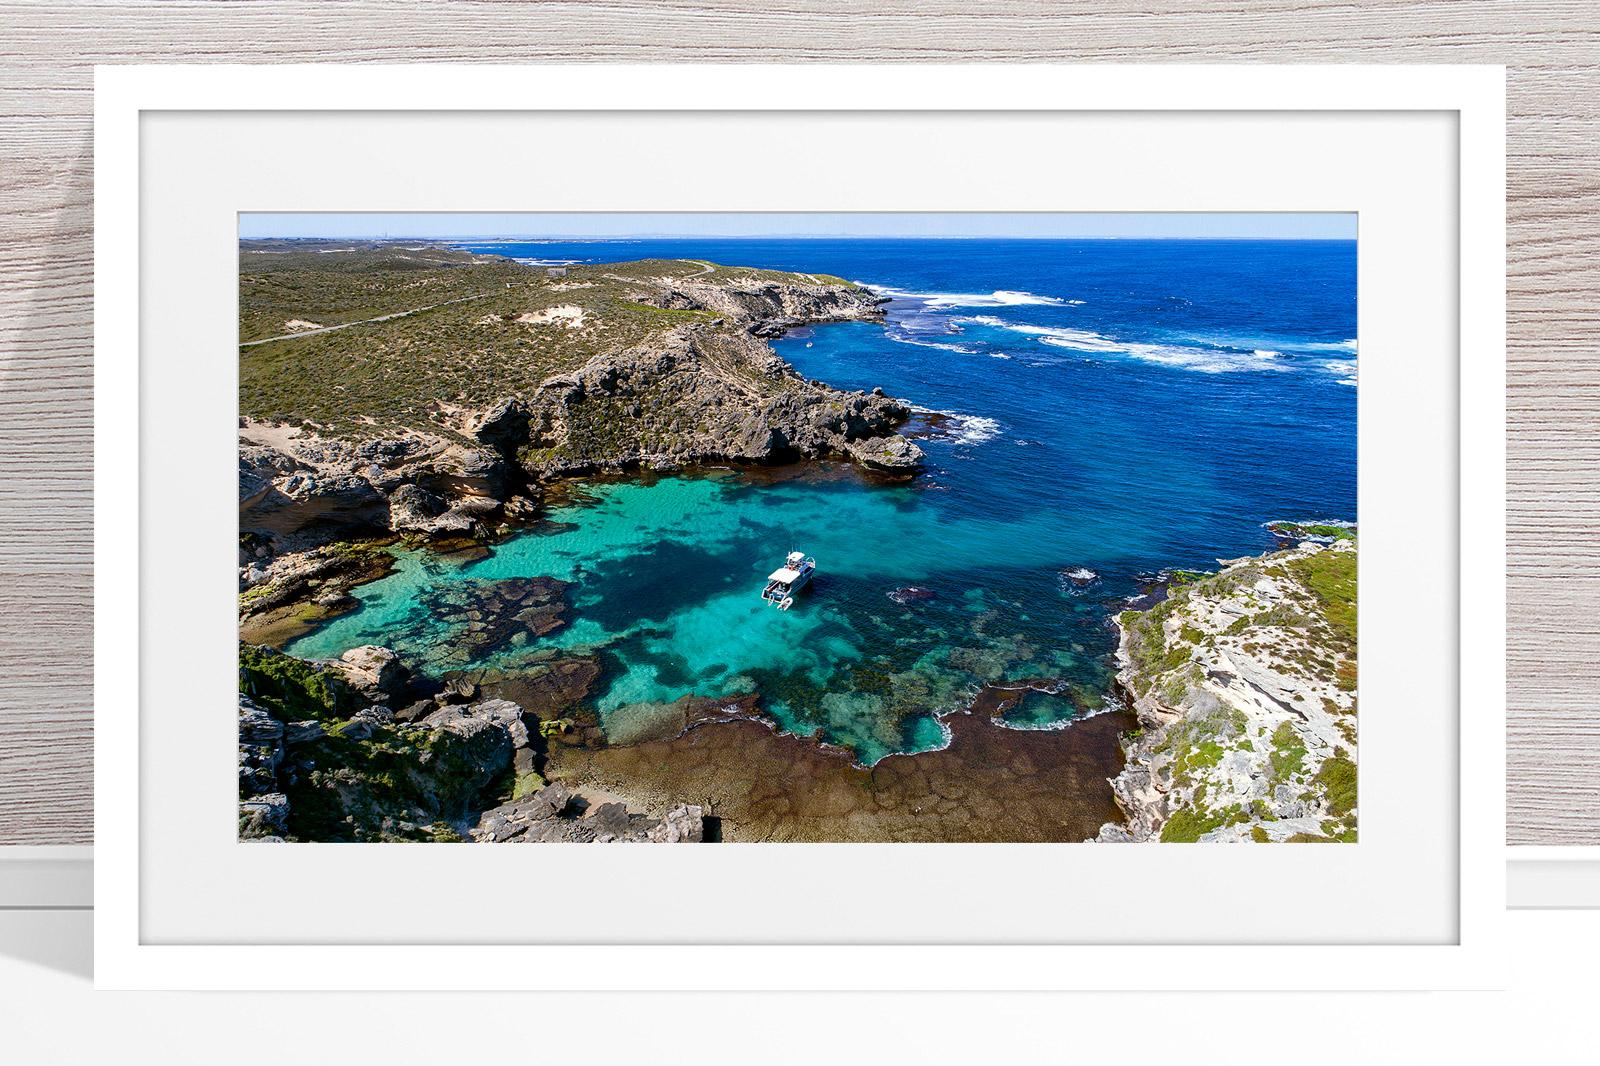 059 - Jason Mazur - 'Fish Hook Bay' White Frame